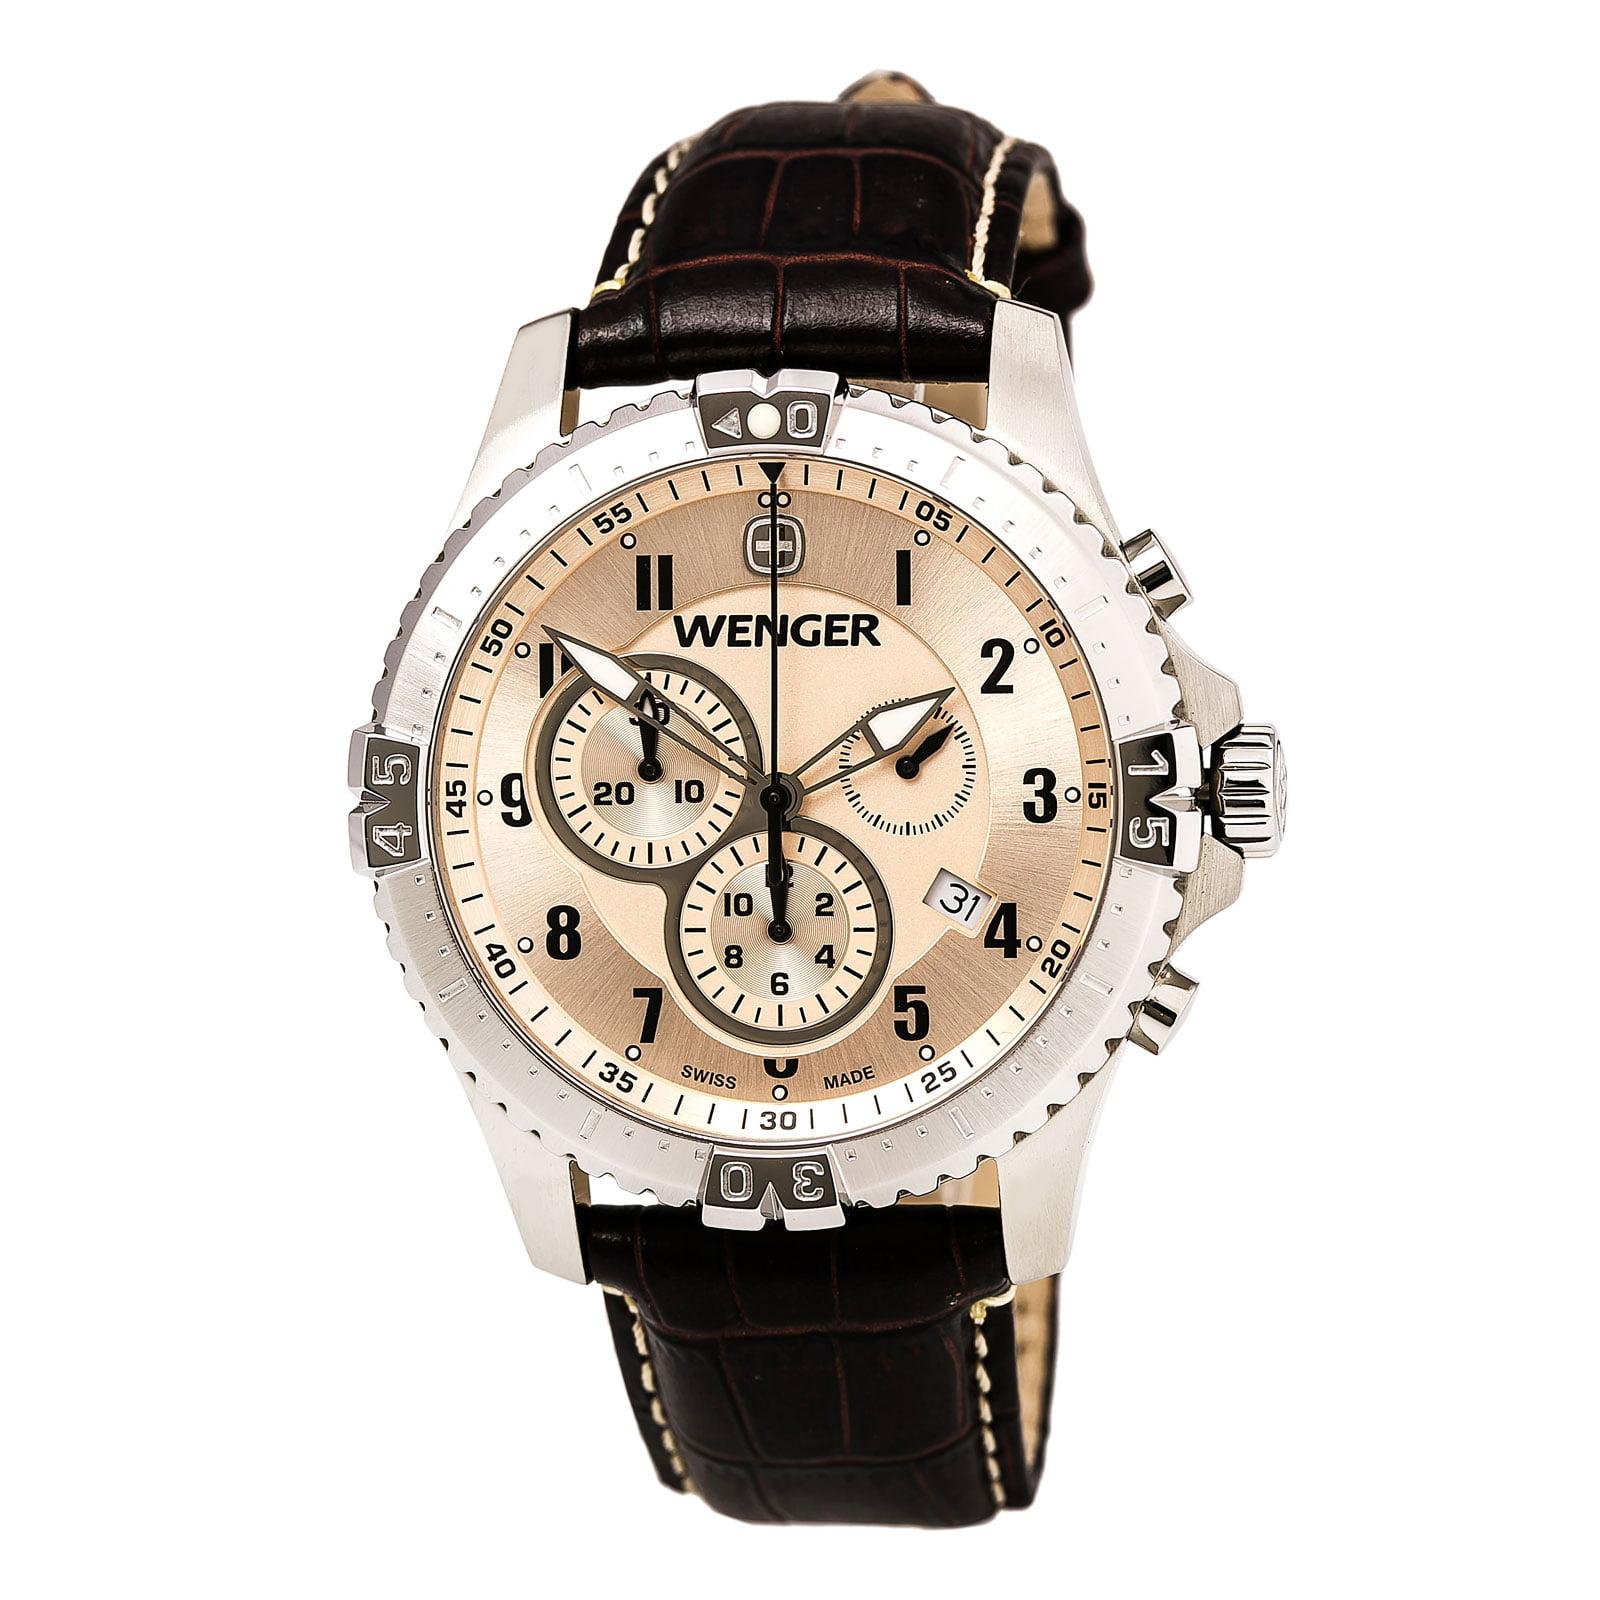 Wenger 77052 Men's Squadron Chrono Leather Strap Antique Silver Dial Chronograph Watch